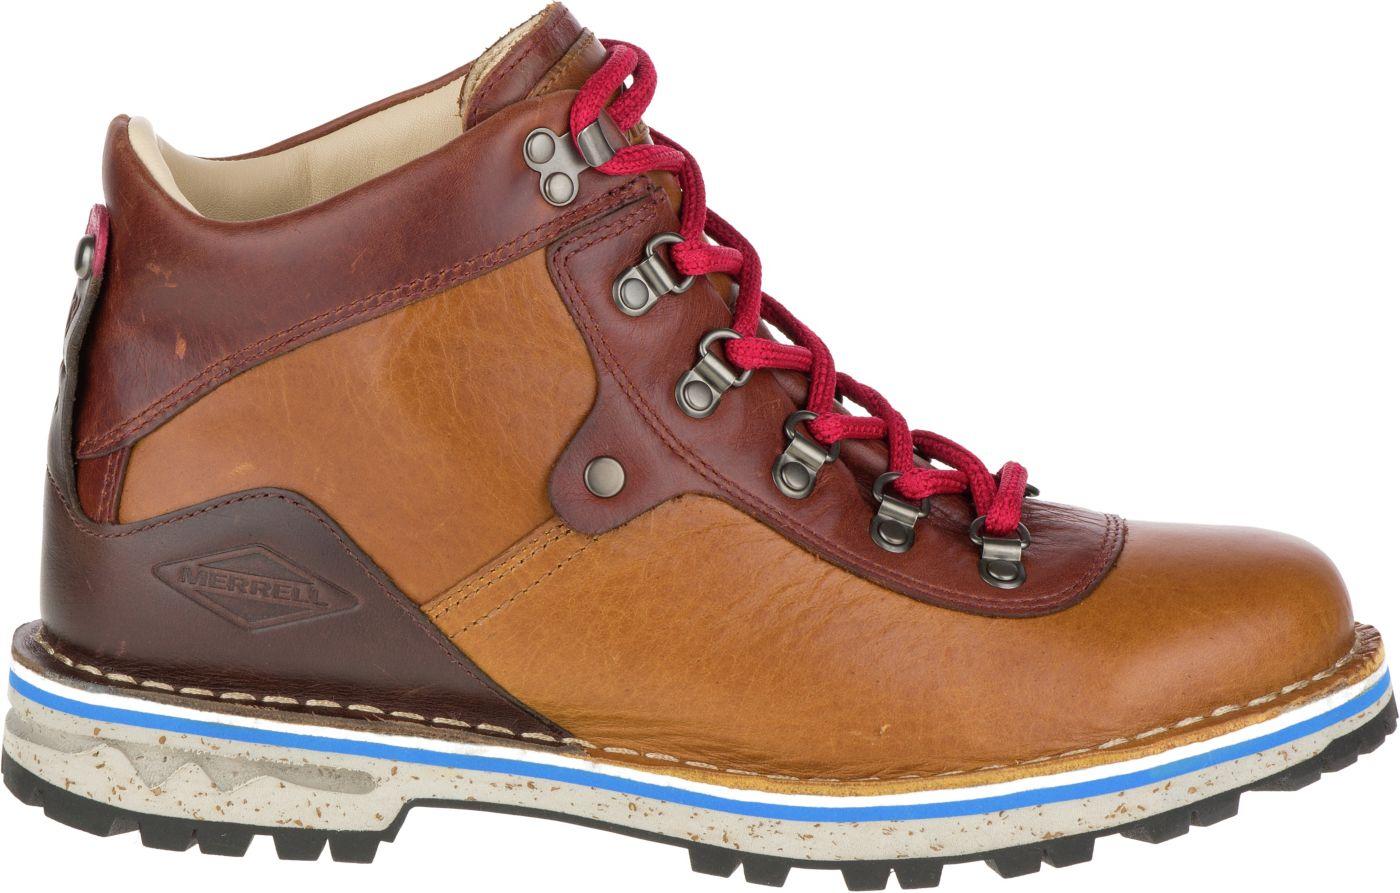 Merrell Women's Sugarbush Waterproof Hiking Boots